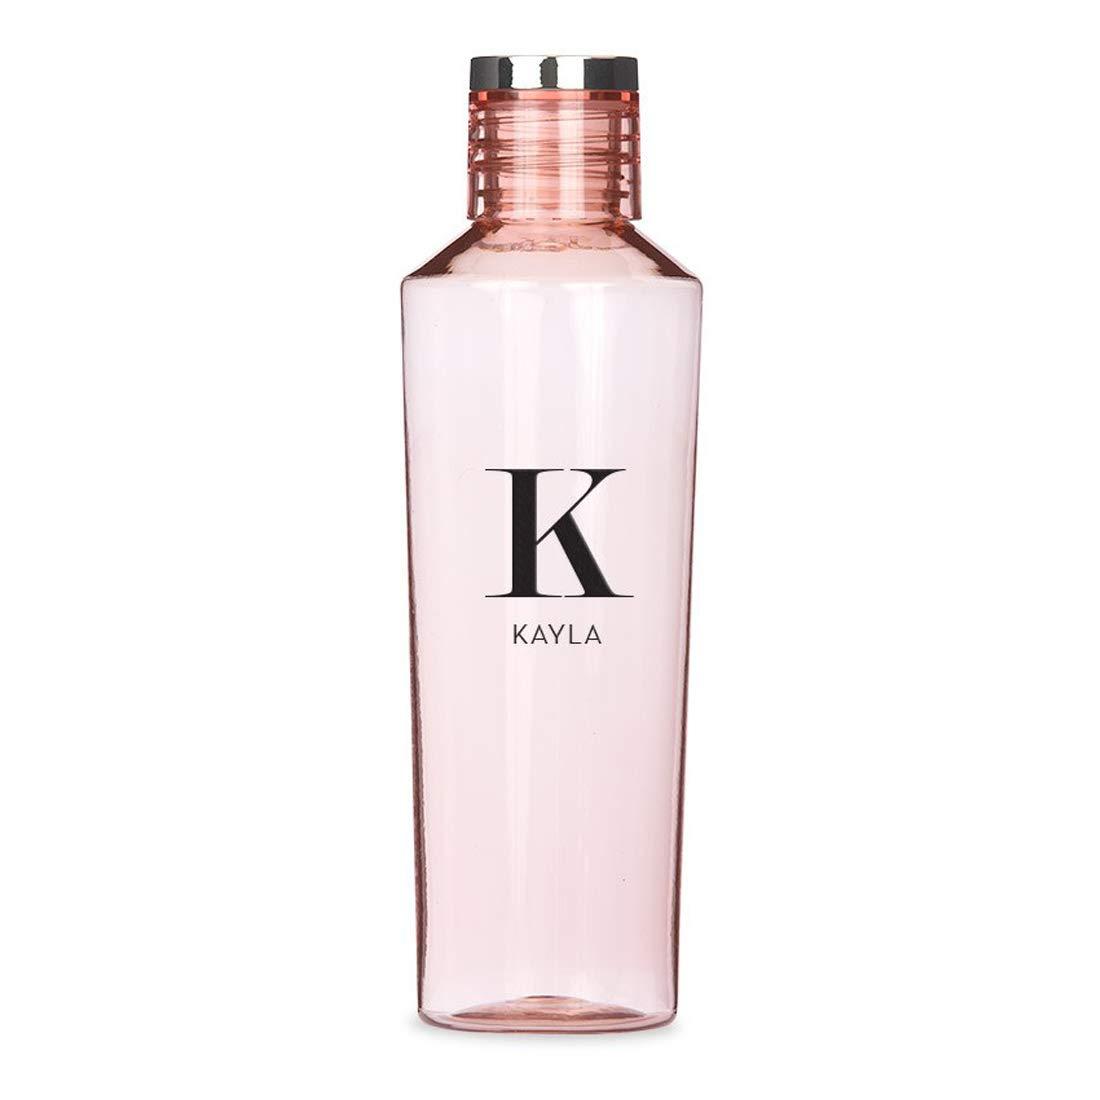 Weddingstar Personalized Tritan Plastic Water Bottle 27oz – Reusable Customizable Eco-Friendly Plastic Water Bottle – 100% BPA-Free, Environmentally Friendly Canteen - Serif Monogram Light Pink